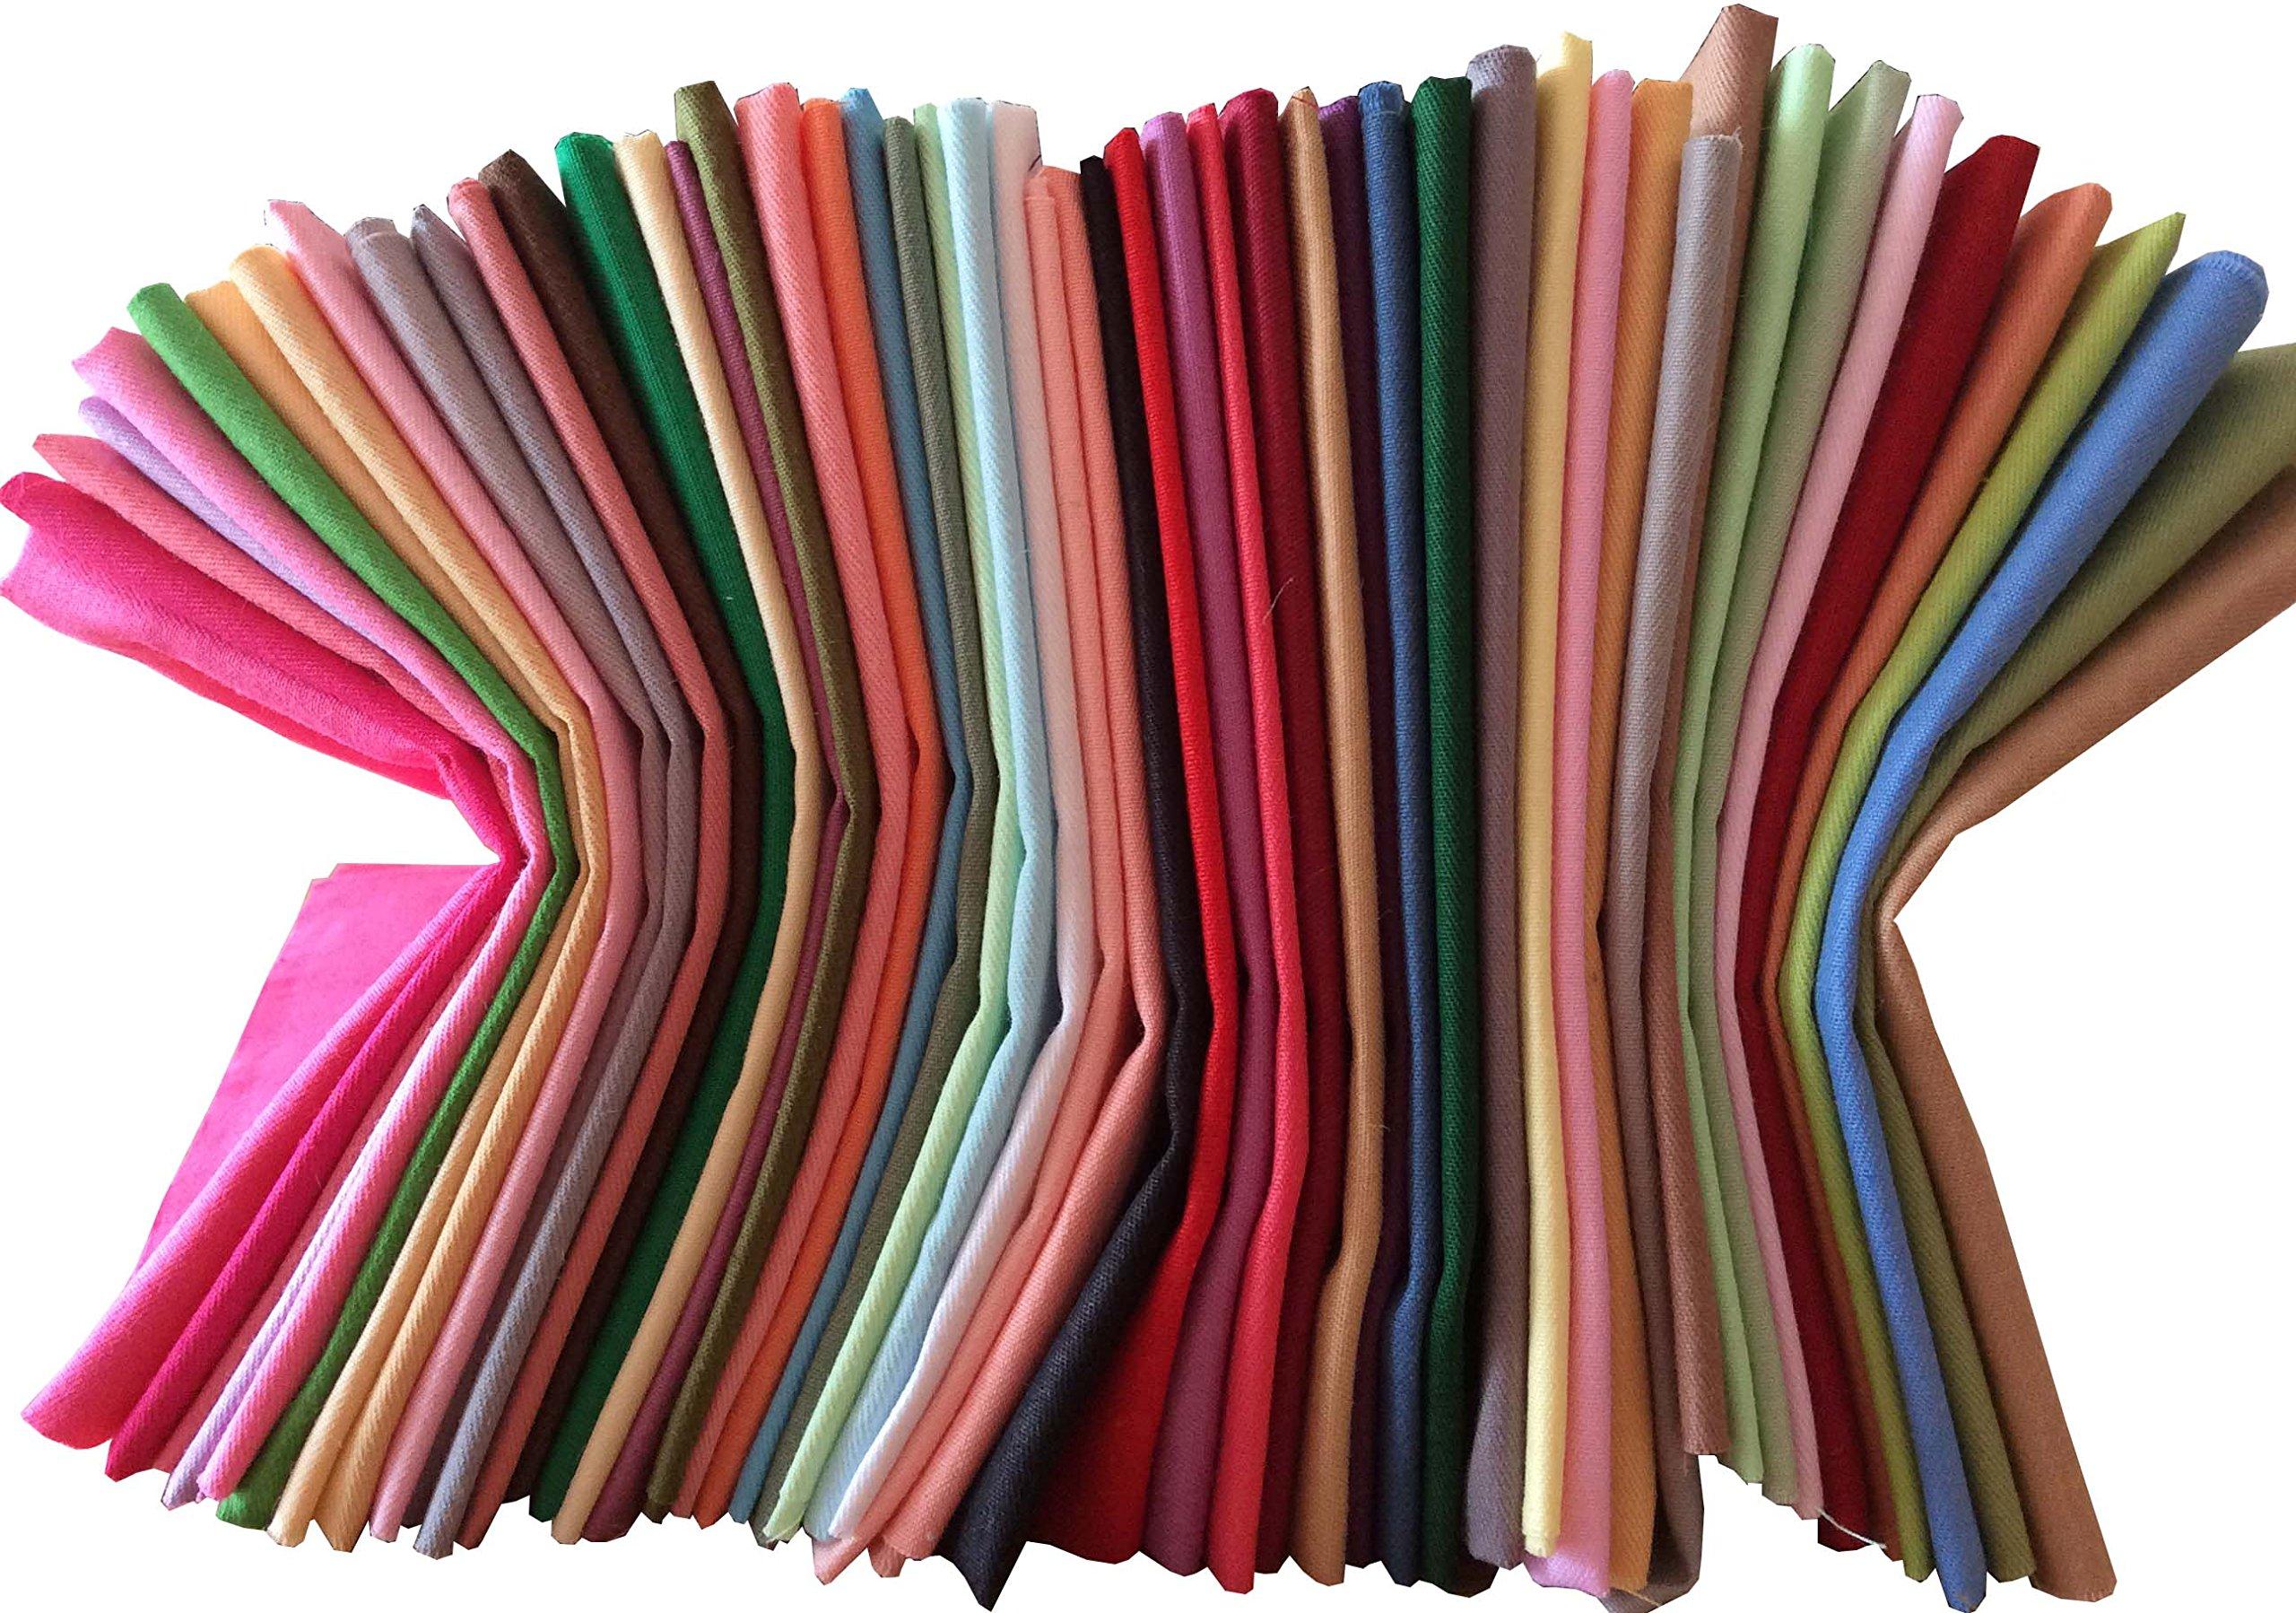 longshine-us 25pcs Solid Colors Premium Cotton Craft Fabric Bundle Squares Patchwork Lint DIY Sewing Scrapbooking Quilting Dot Pattern Artcraft (10'' x 10'') by longshine-us (Image #5)